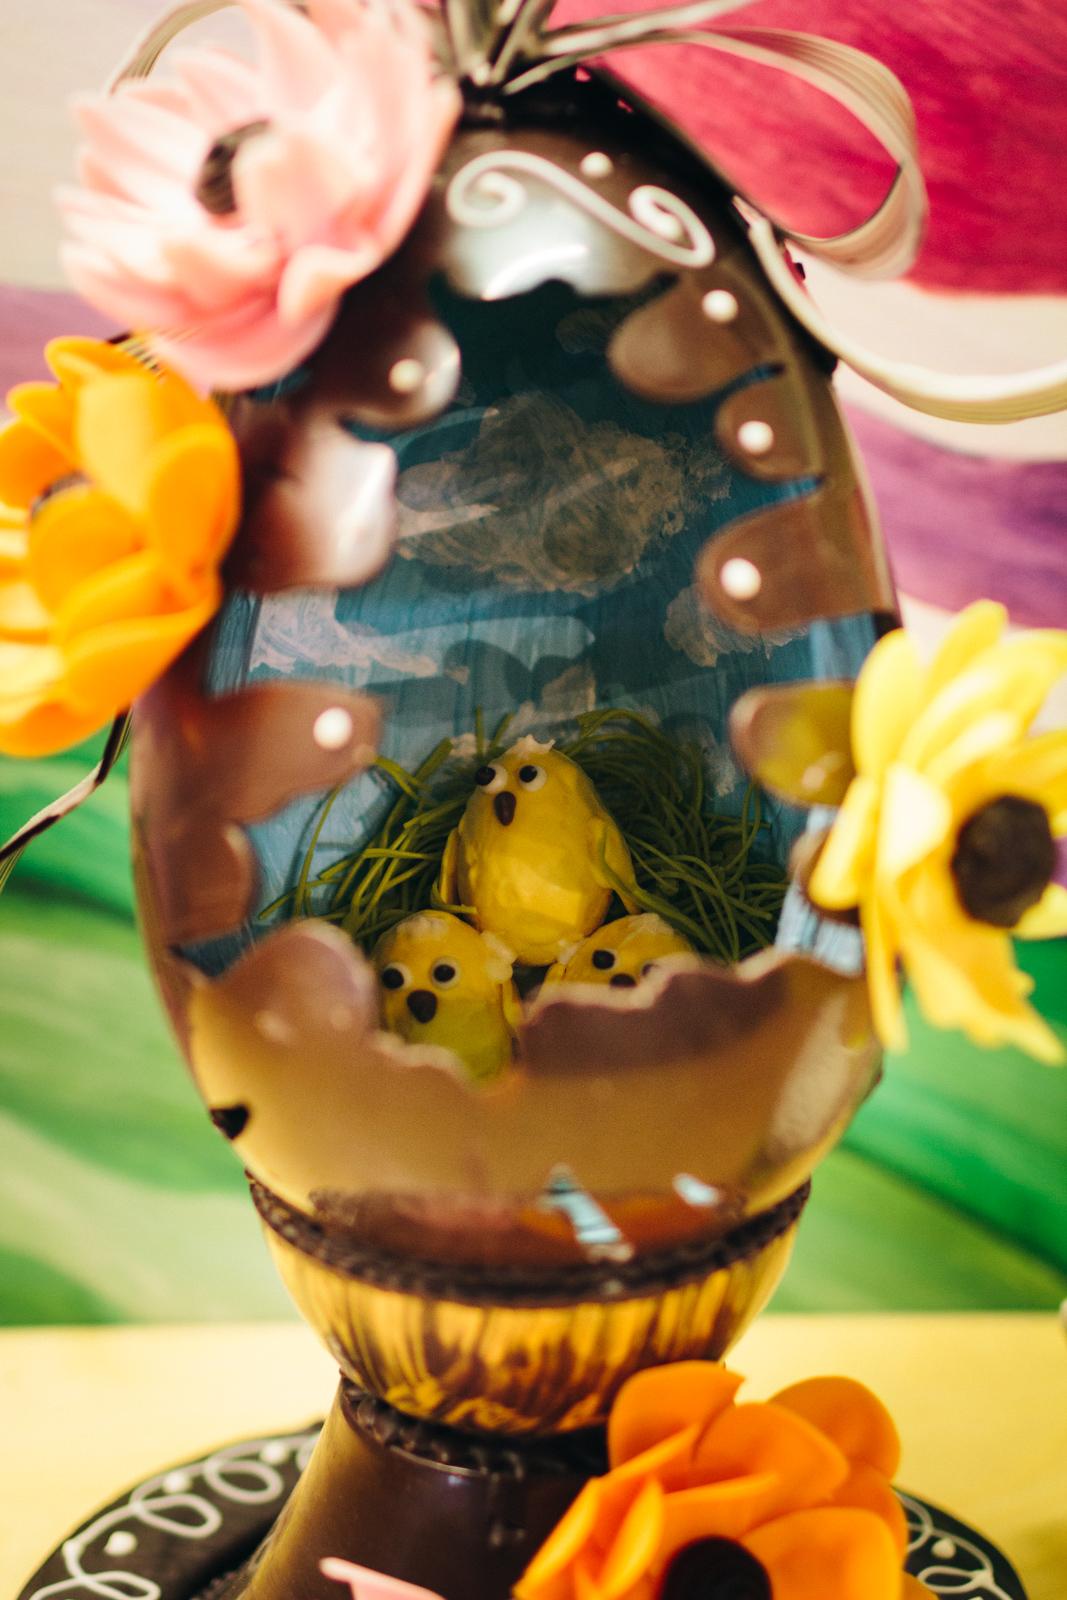 spring-chocolate-sculpture-2.jpg